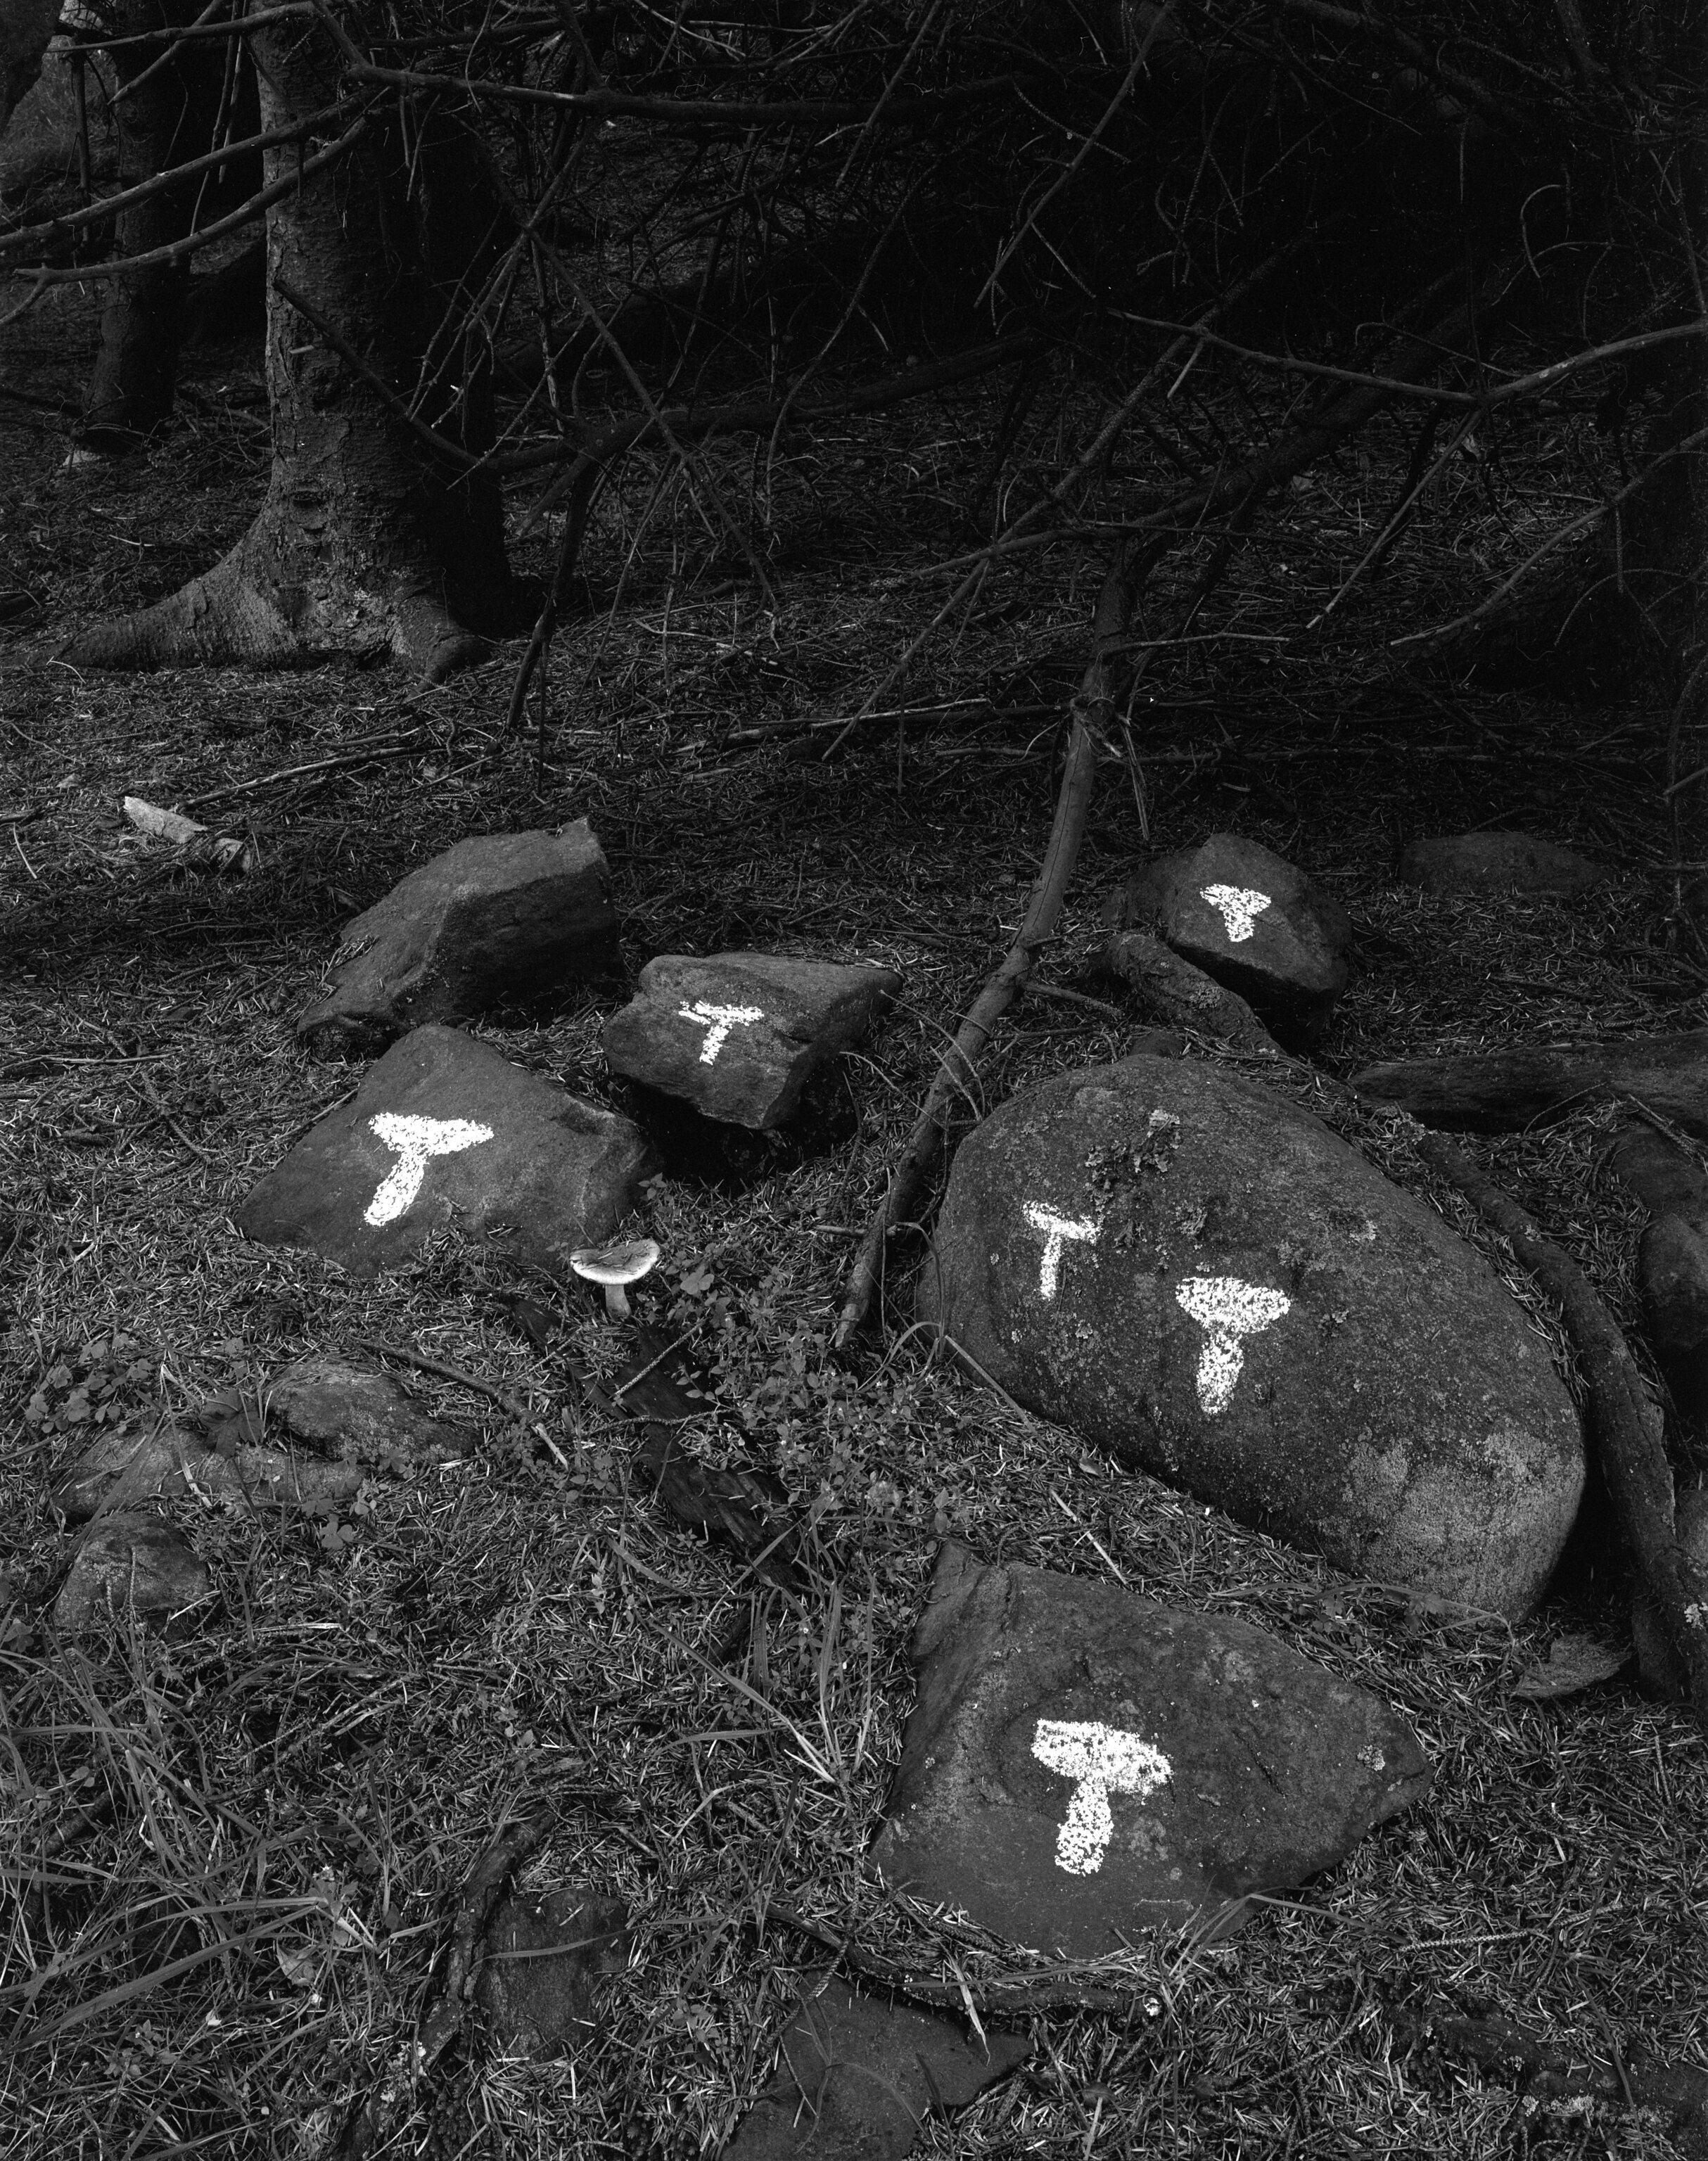 Mushrooms drawn on Rock with chalk